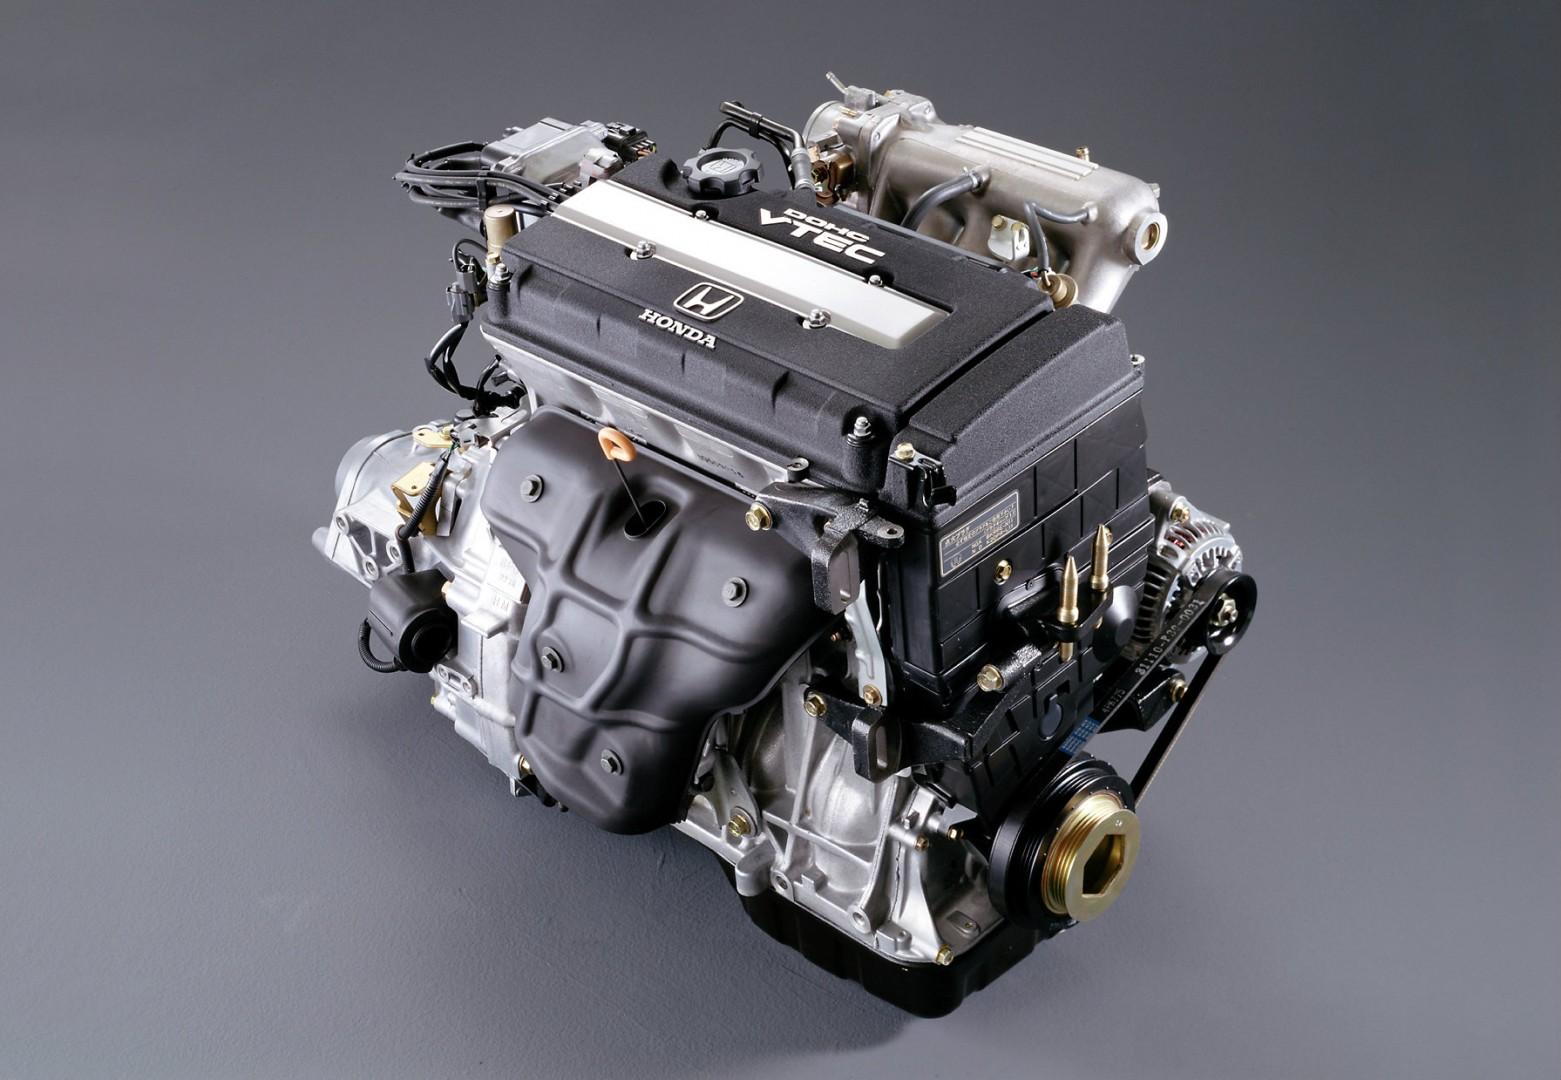 Honda Dohc Vtec Honda Dohc Vtec Honda B16 Civic Type R Civic Type R Pic1